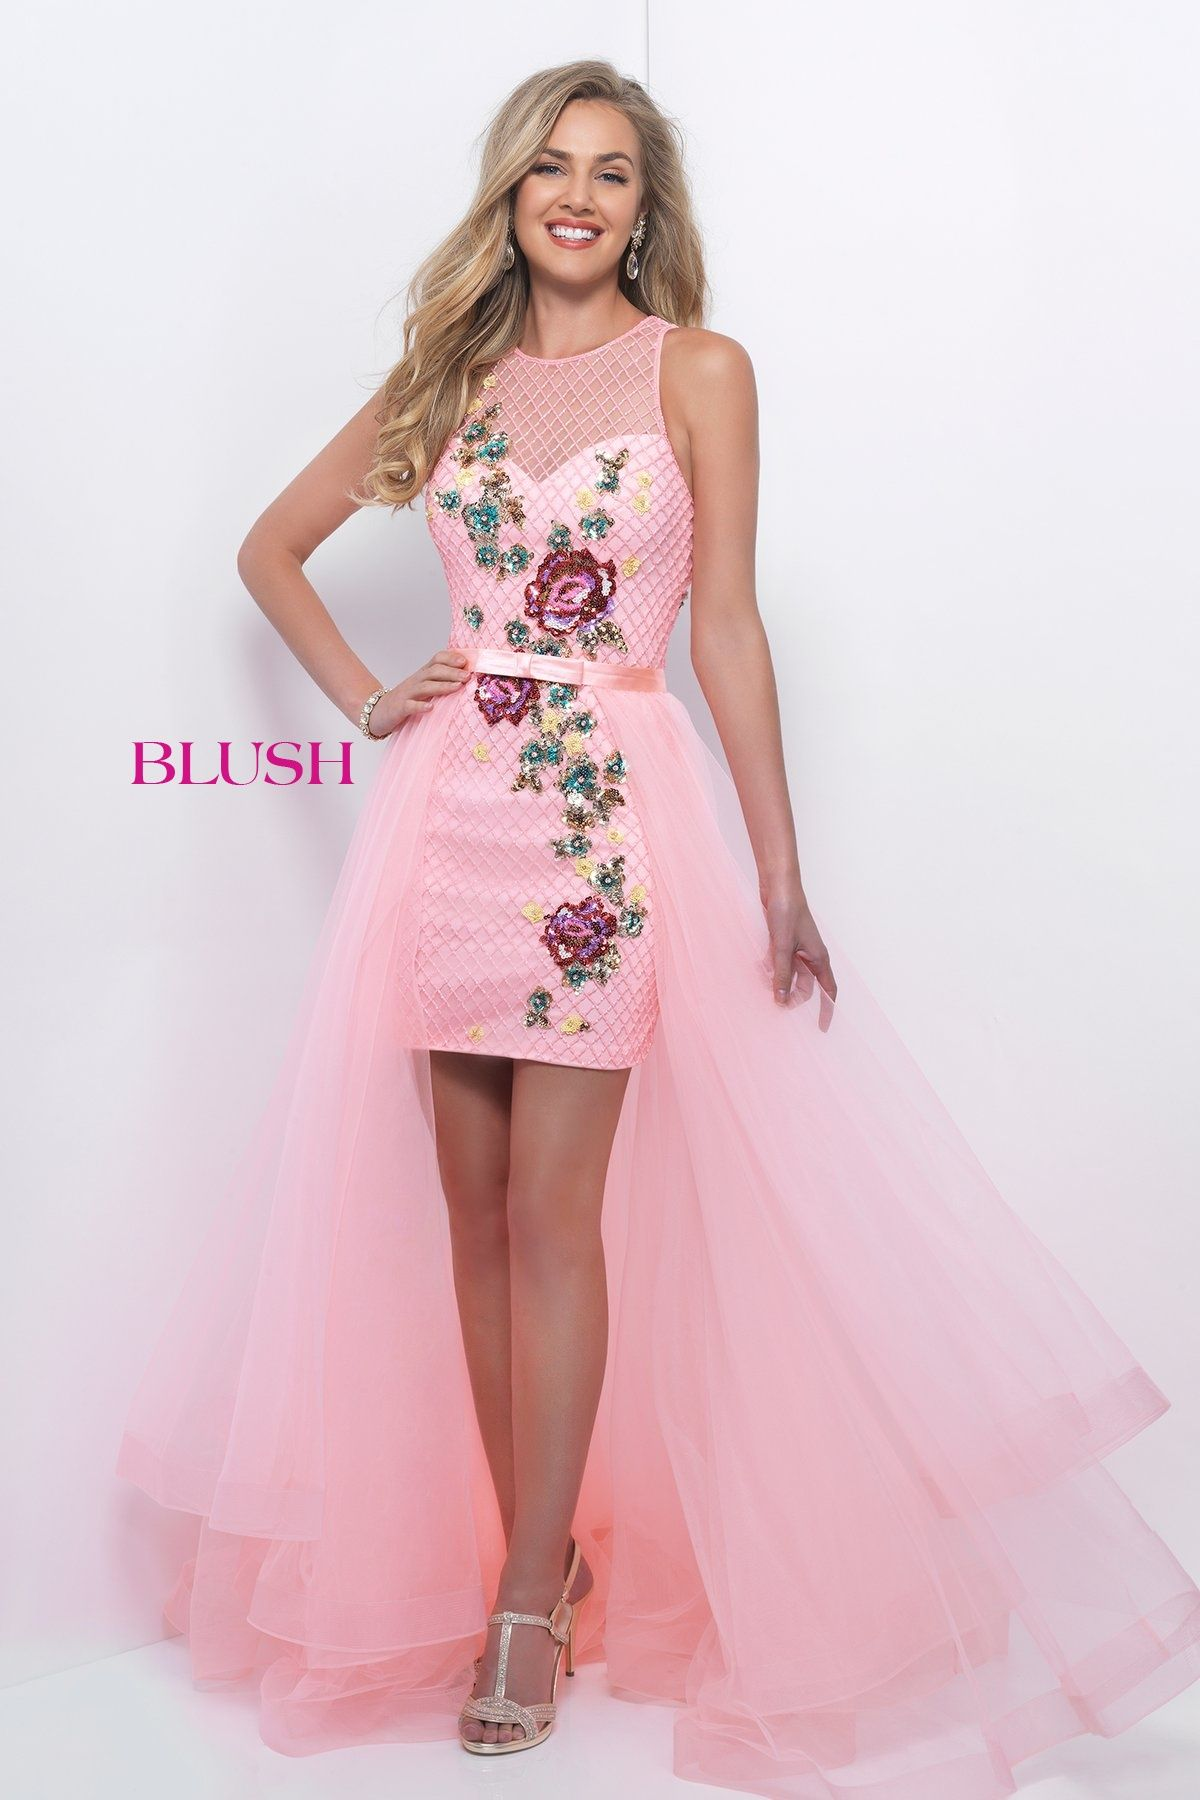 blush prom dresses style 11205 style 11205 FNZGNSG